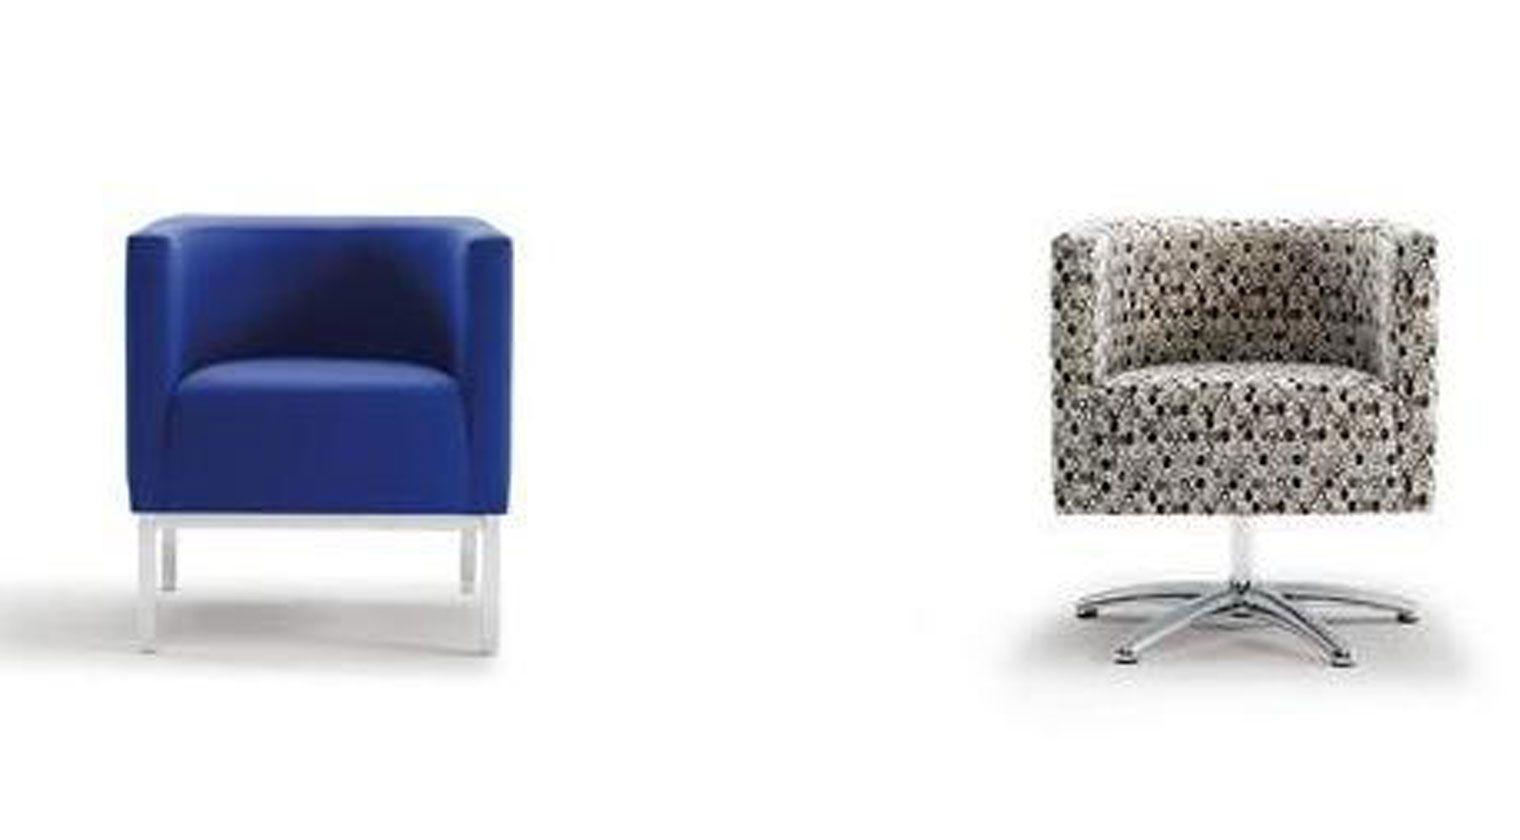 sofas chaise longue baratos madrid free delivery comprar butaca giratoria design delux